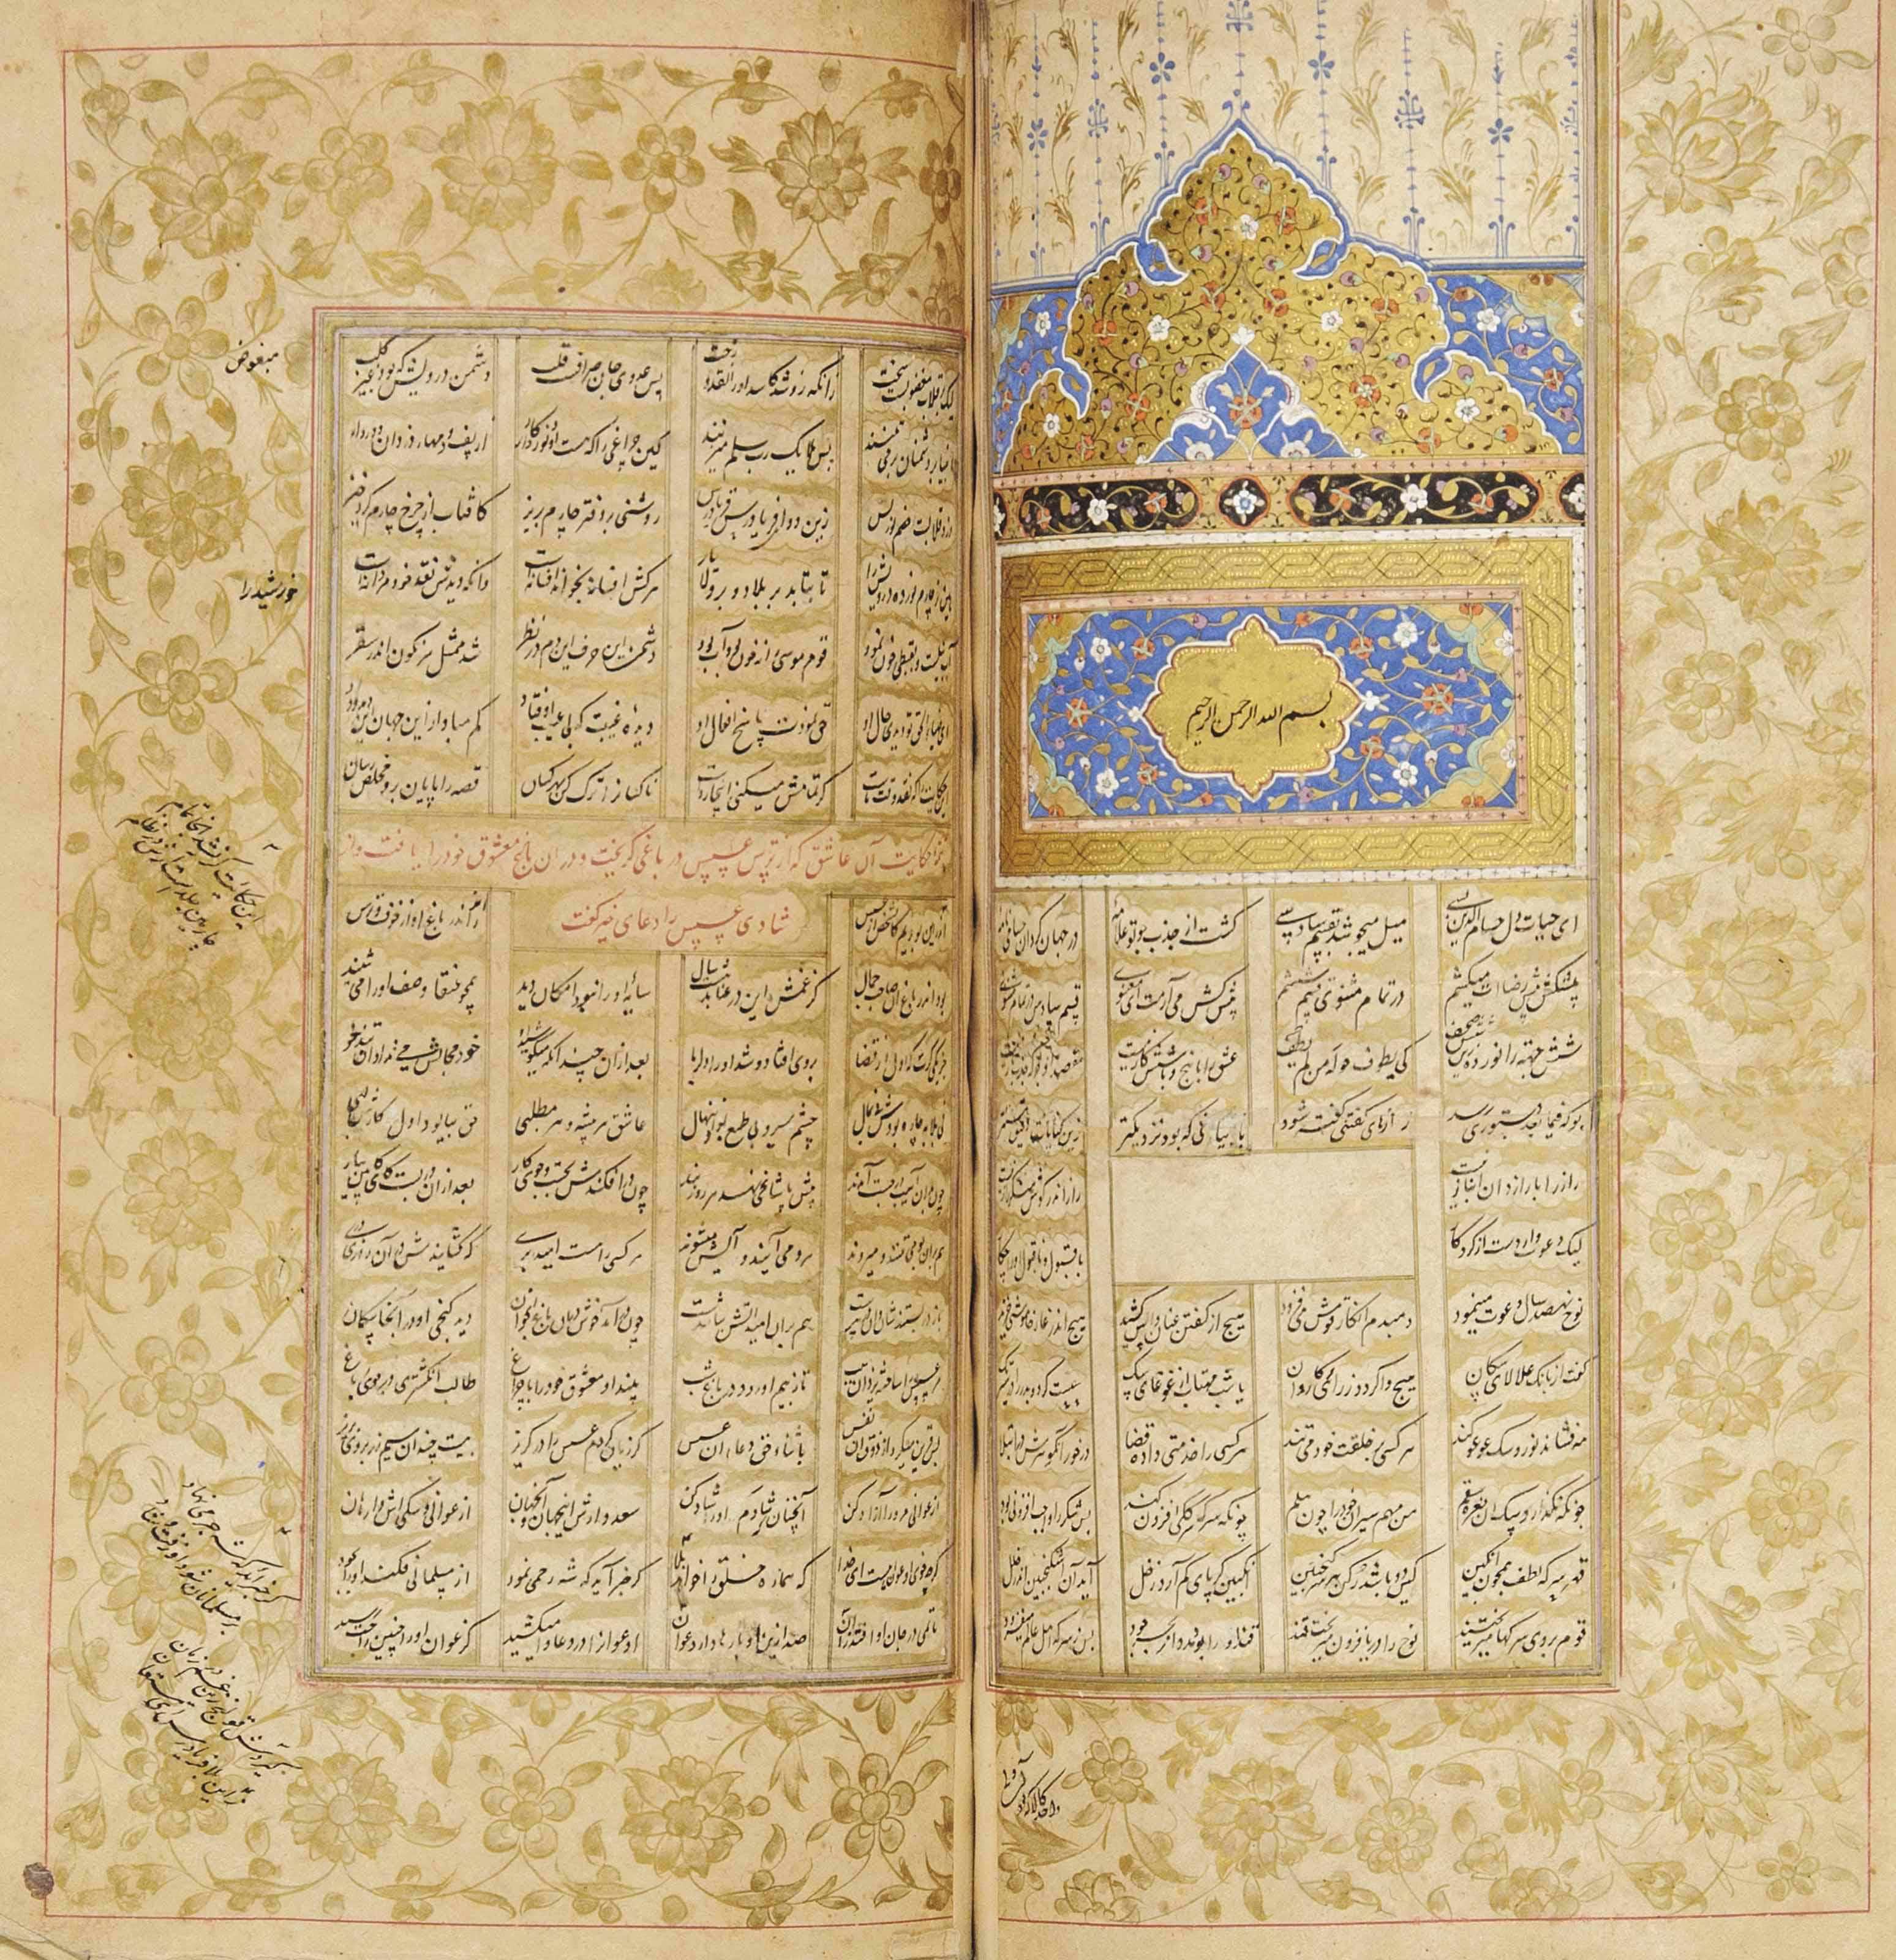 JALAL AL-DIN RUMI (D.1273 AD): MATHNAWI MA'NAWI